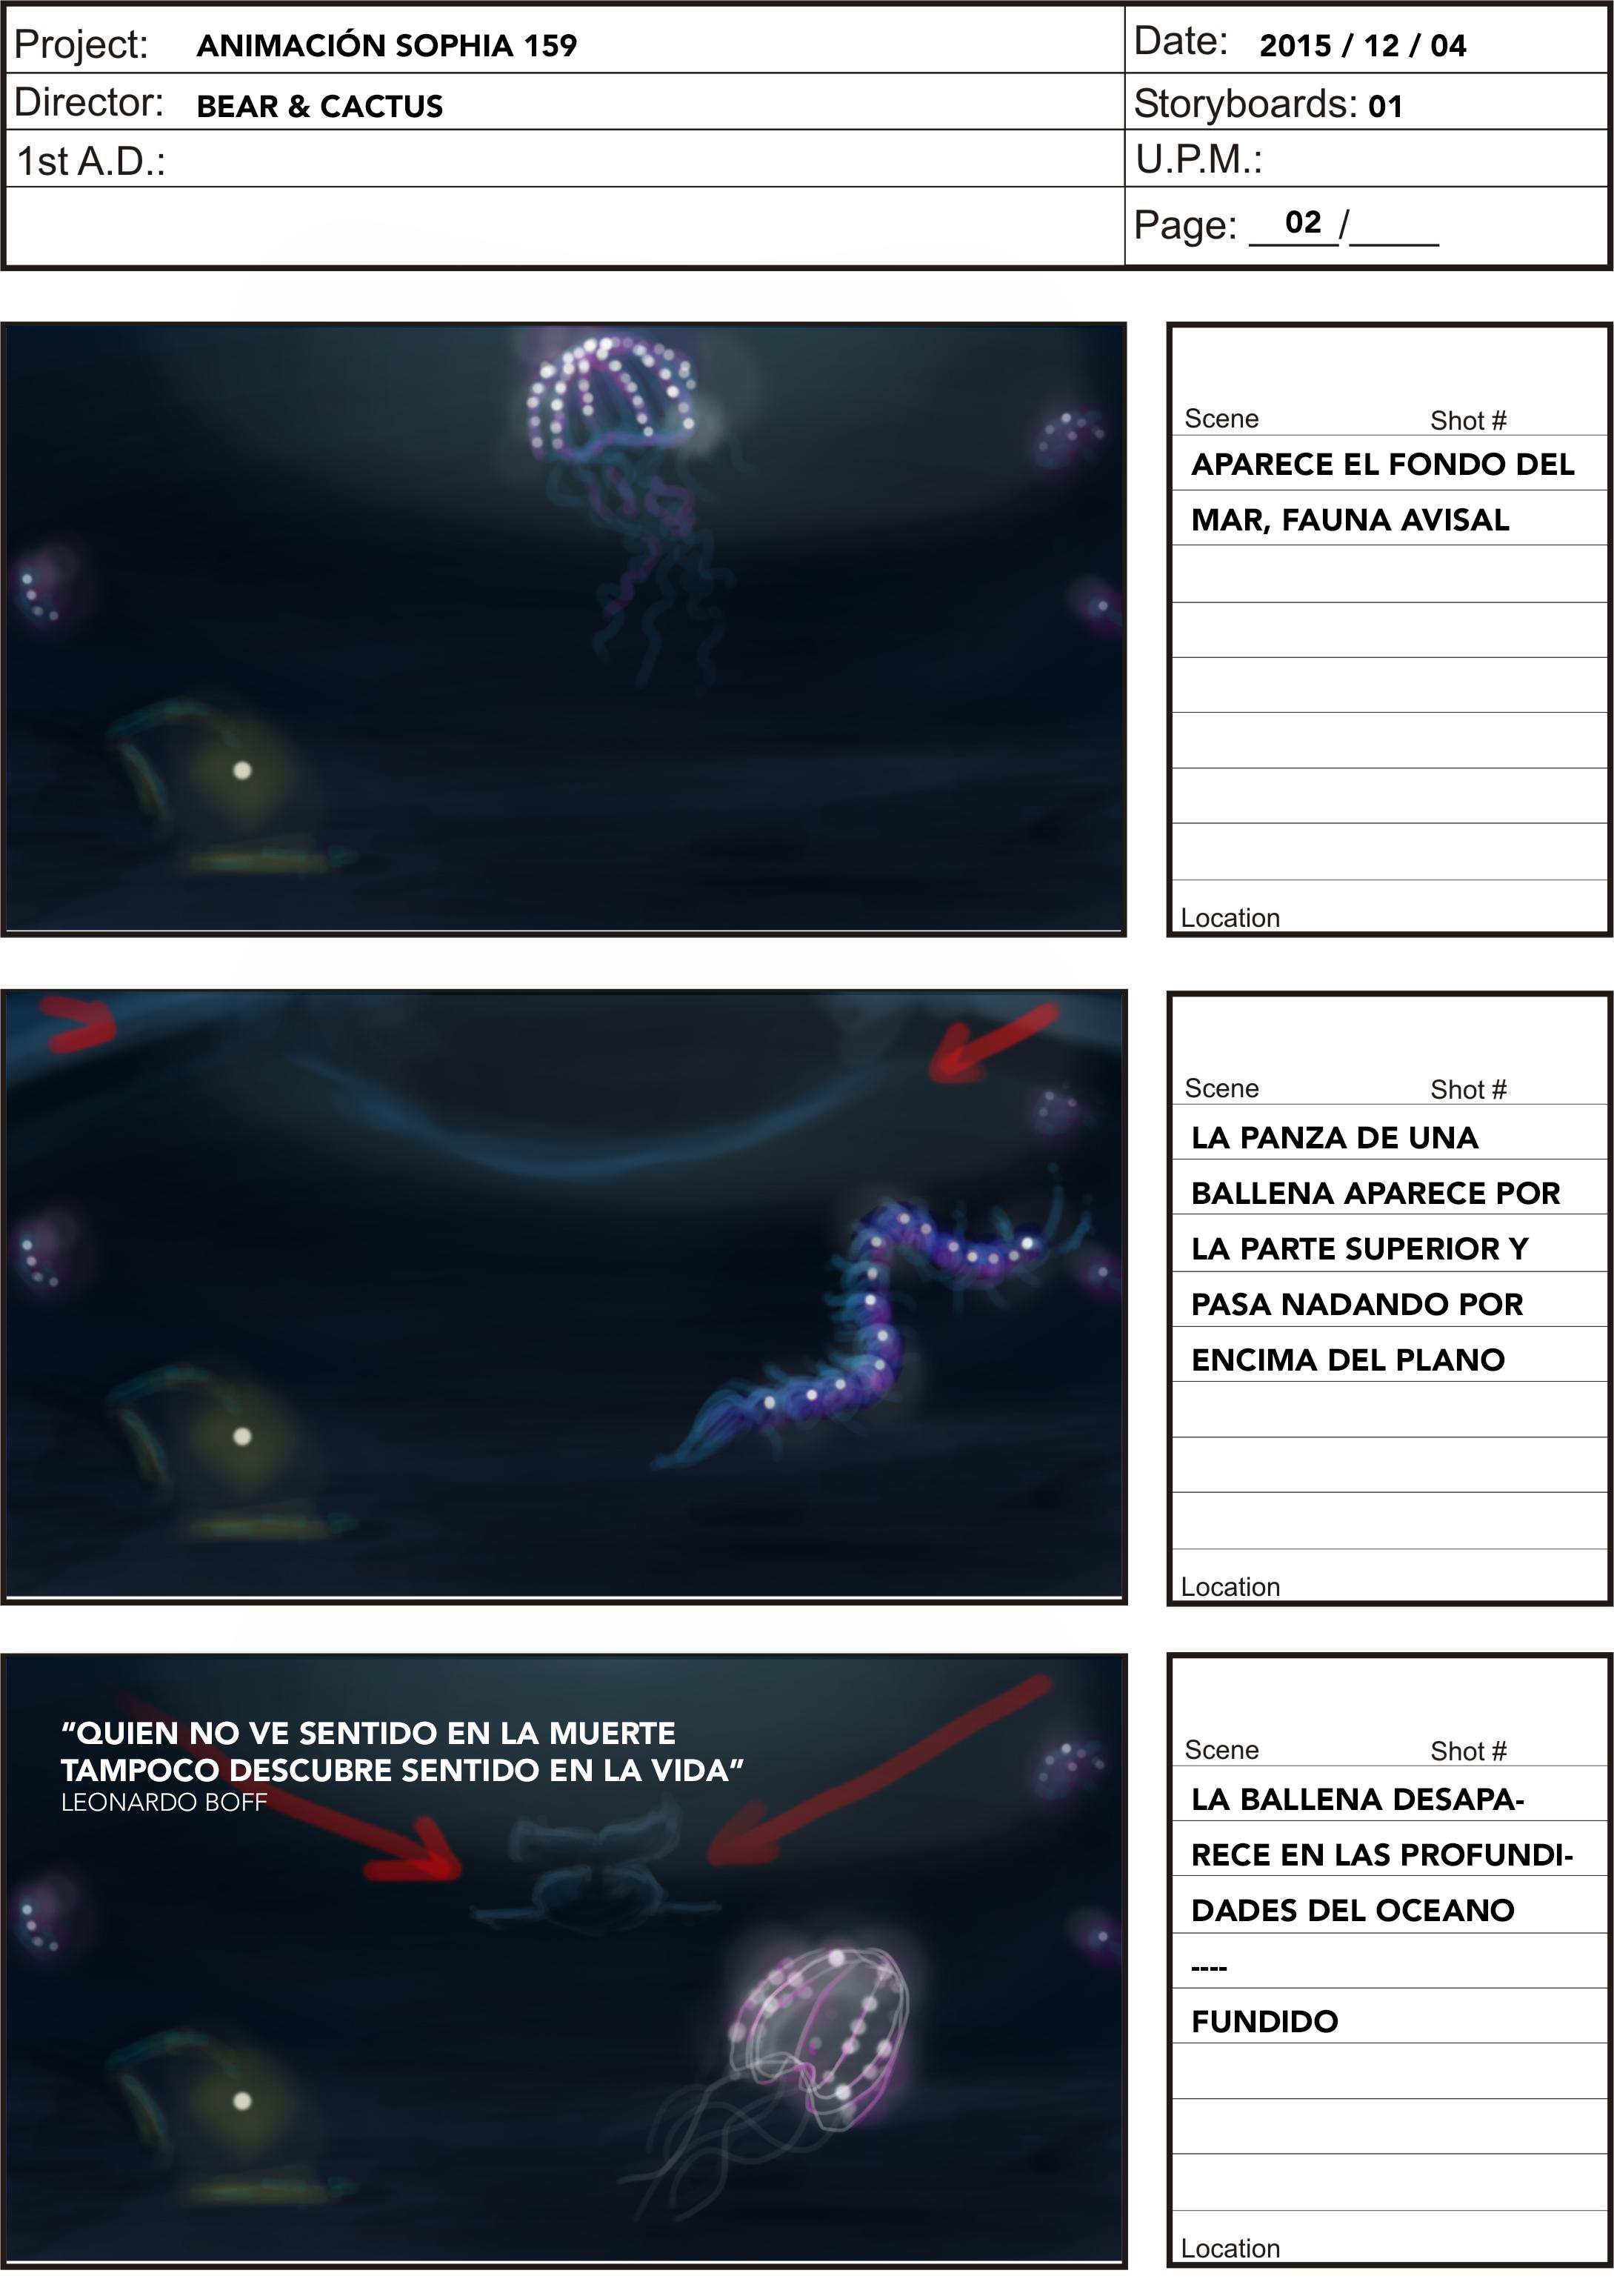 storyboard-sophia159-02_2